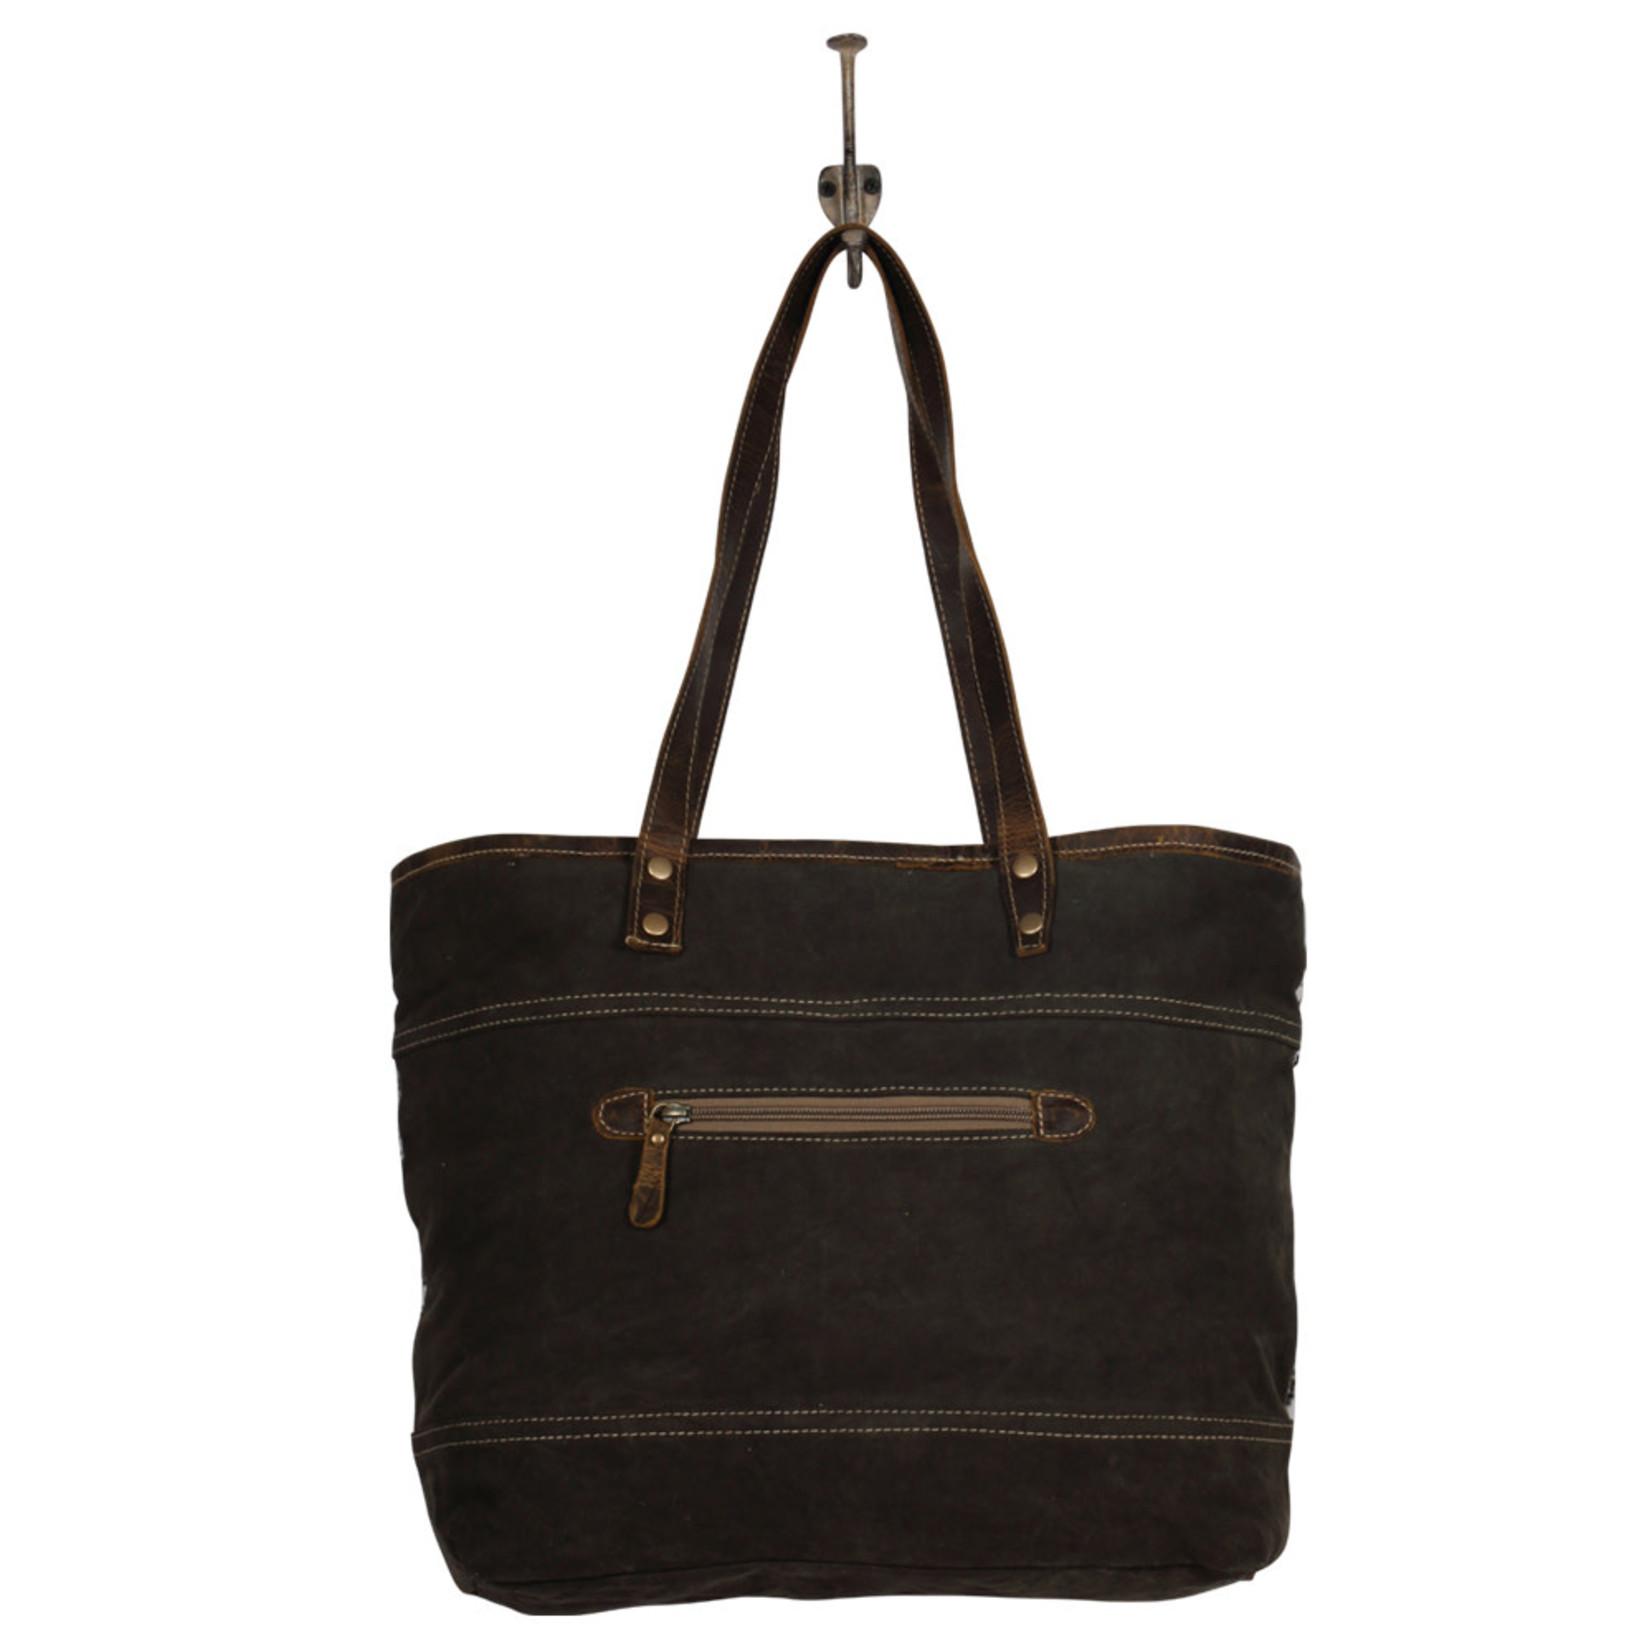 Myra Bags S-2058 Essence Tote Bag